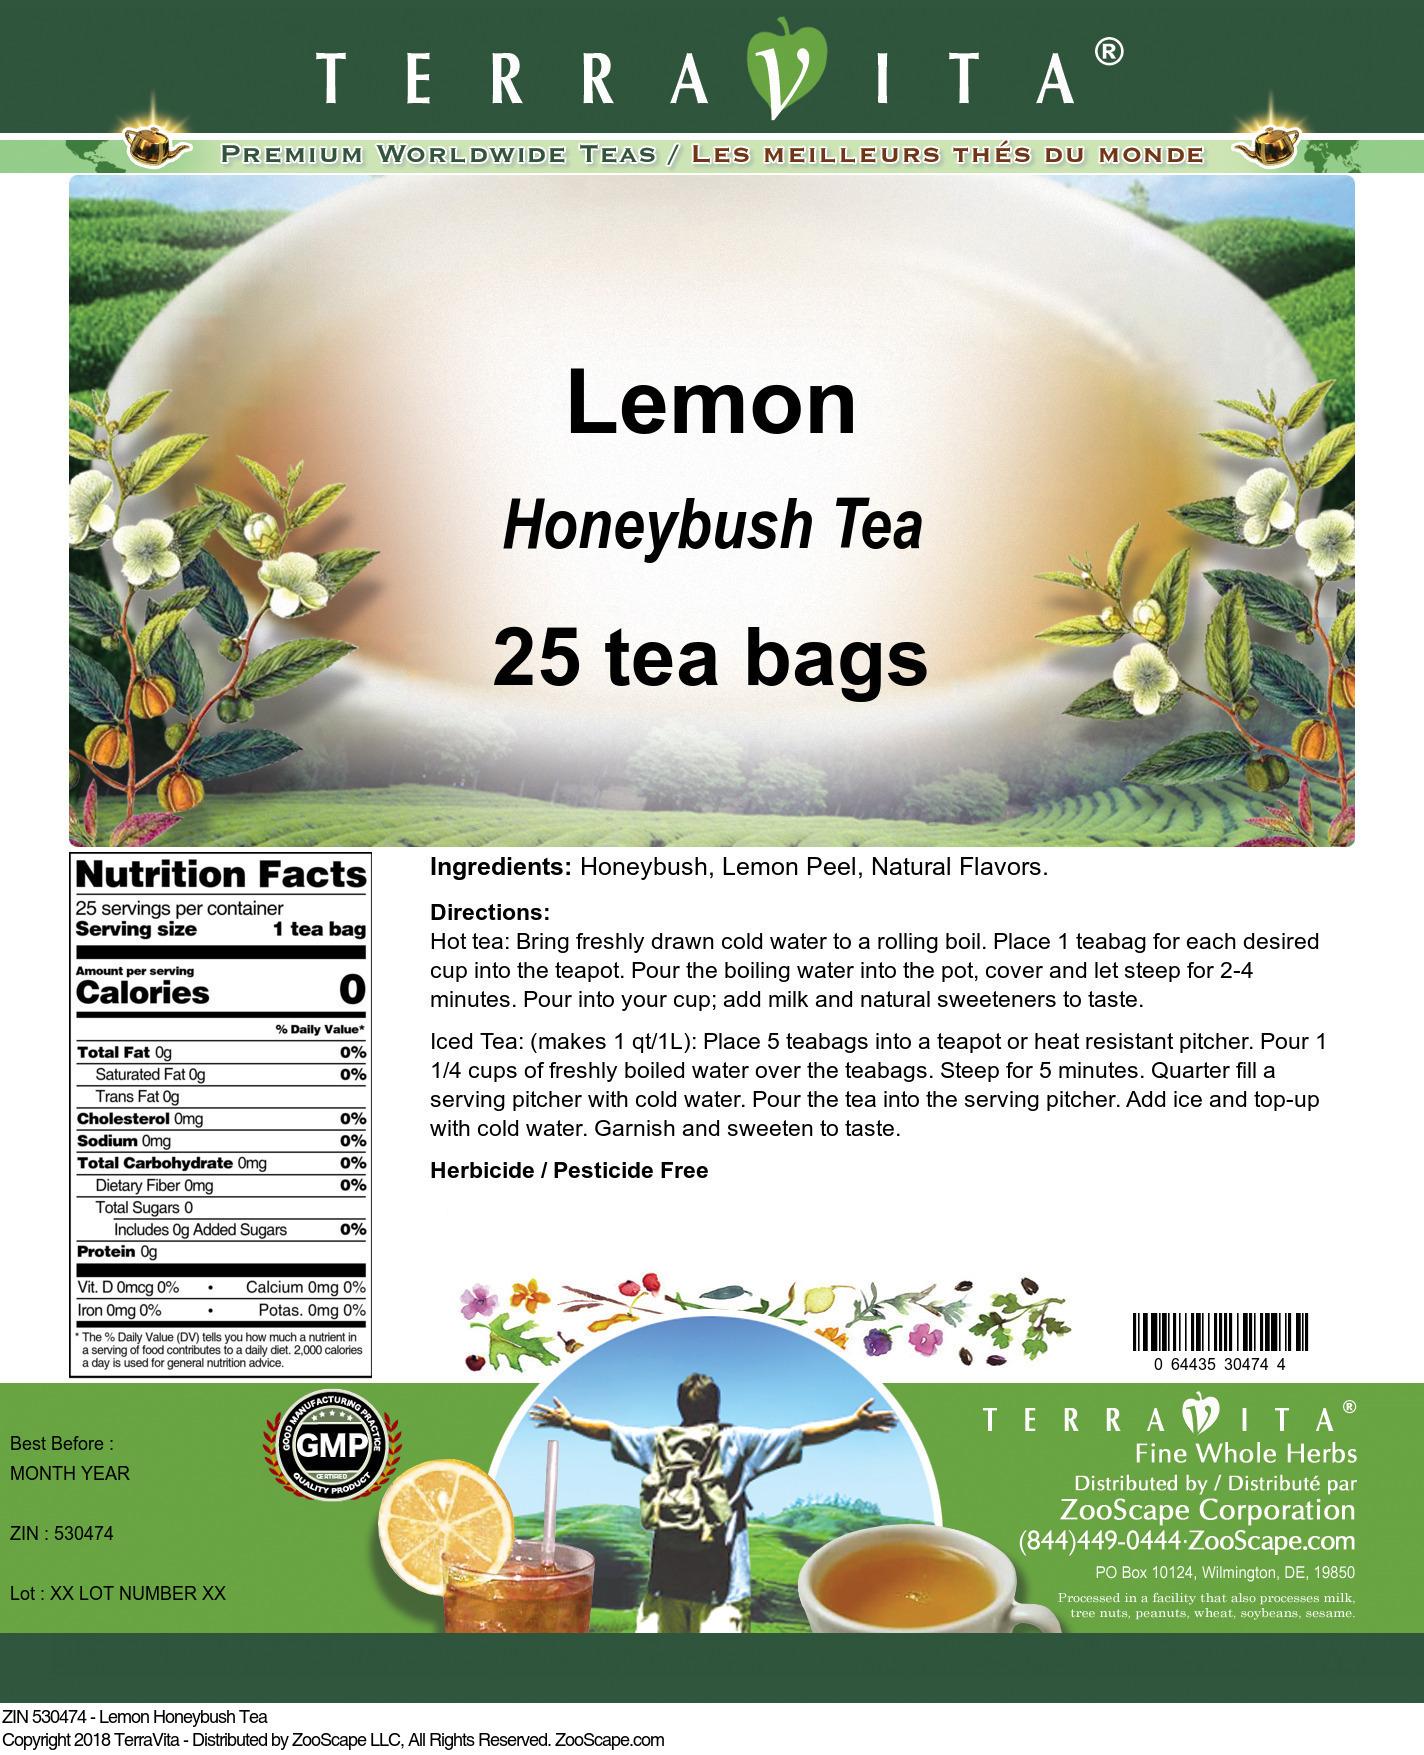 Lemon Honeybush Tea